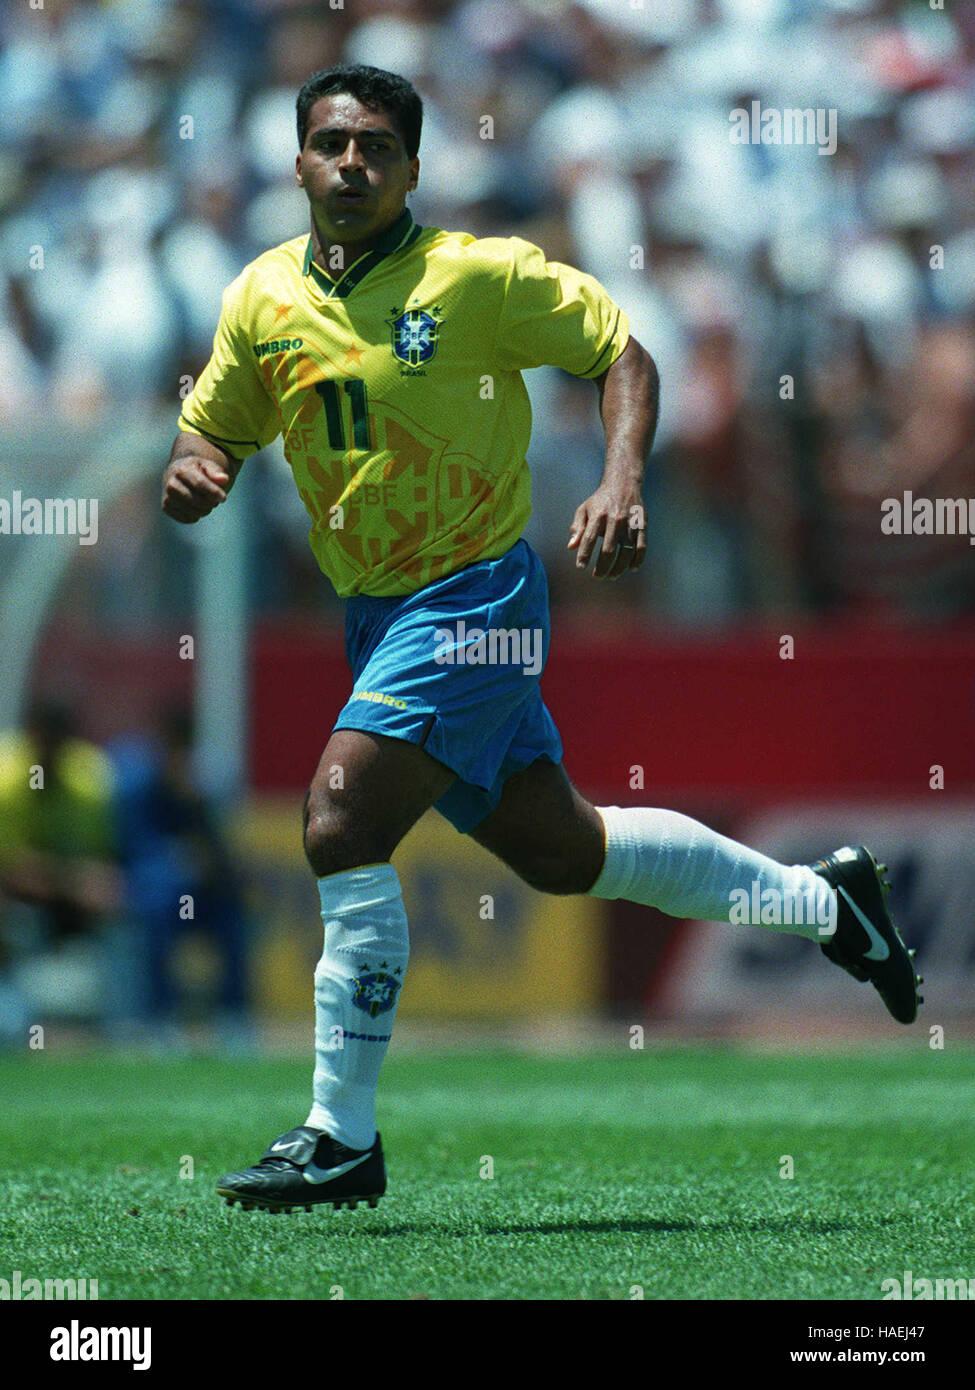 ROMARIO BRAZIL & BARCELONA 08 July 1994 Stock Royalty Free